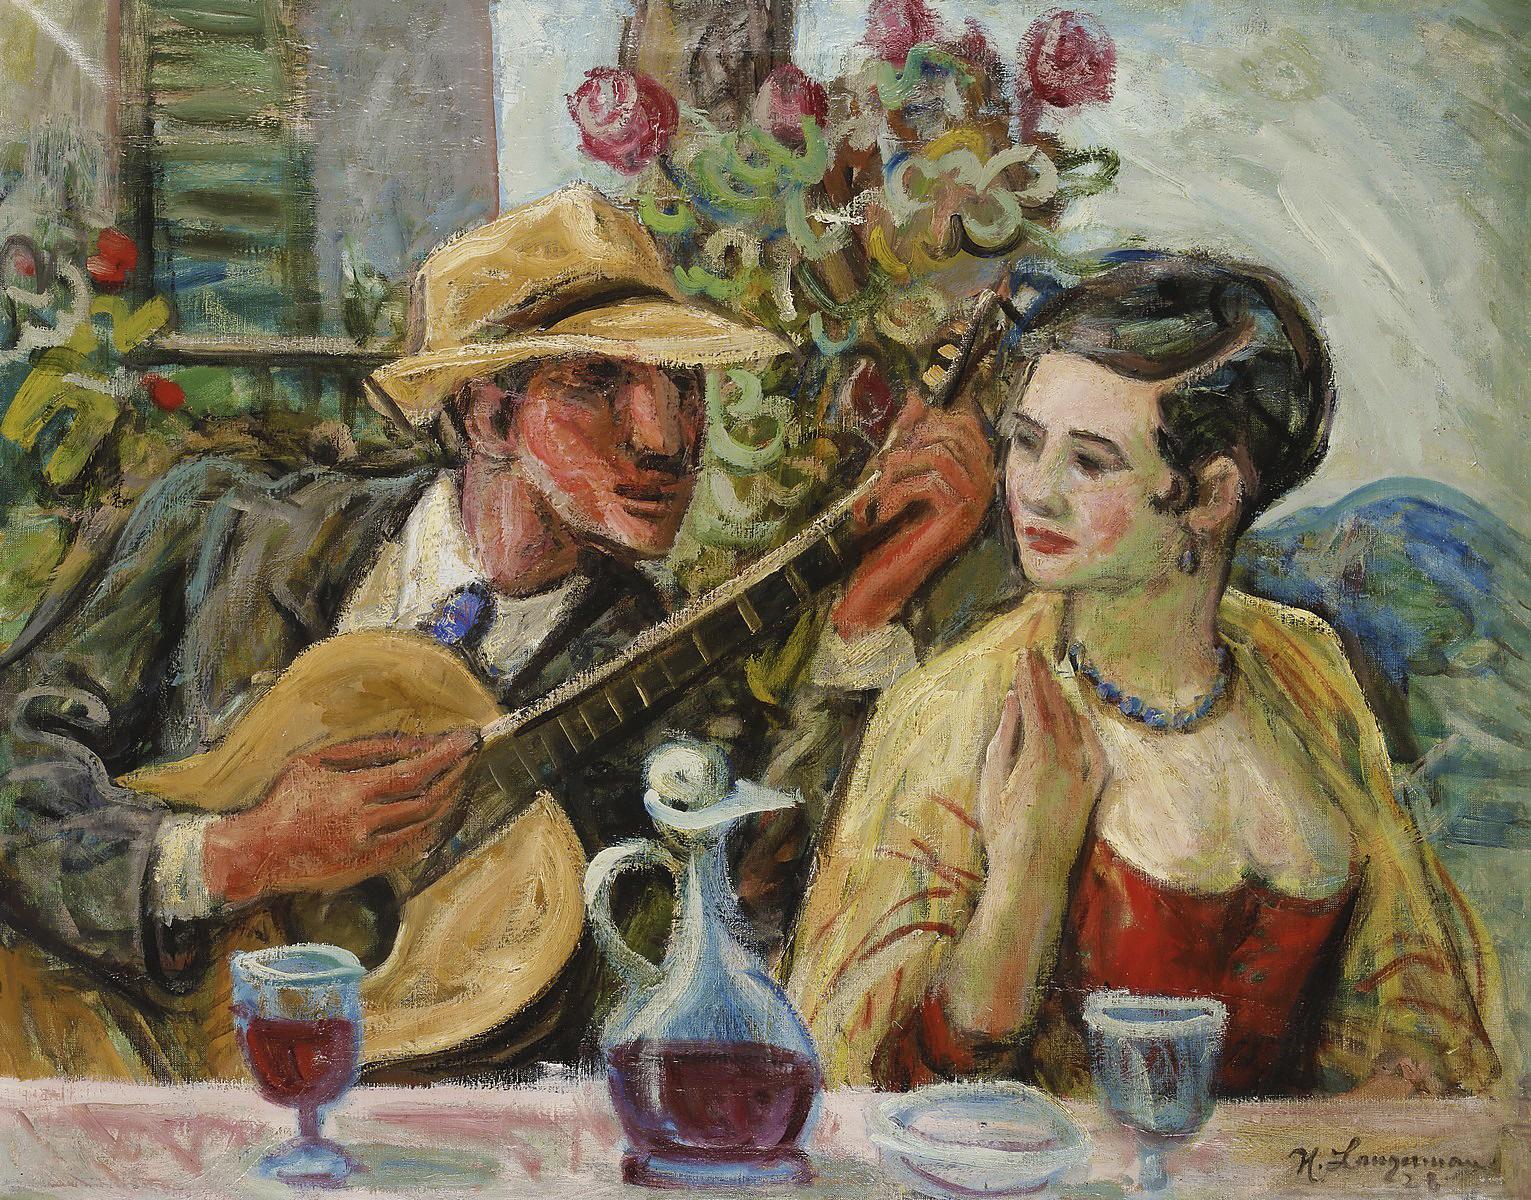 Генрик Лангерман. Серенада, 1926; олія, полотно